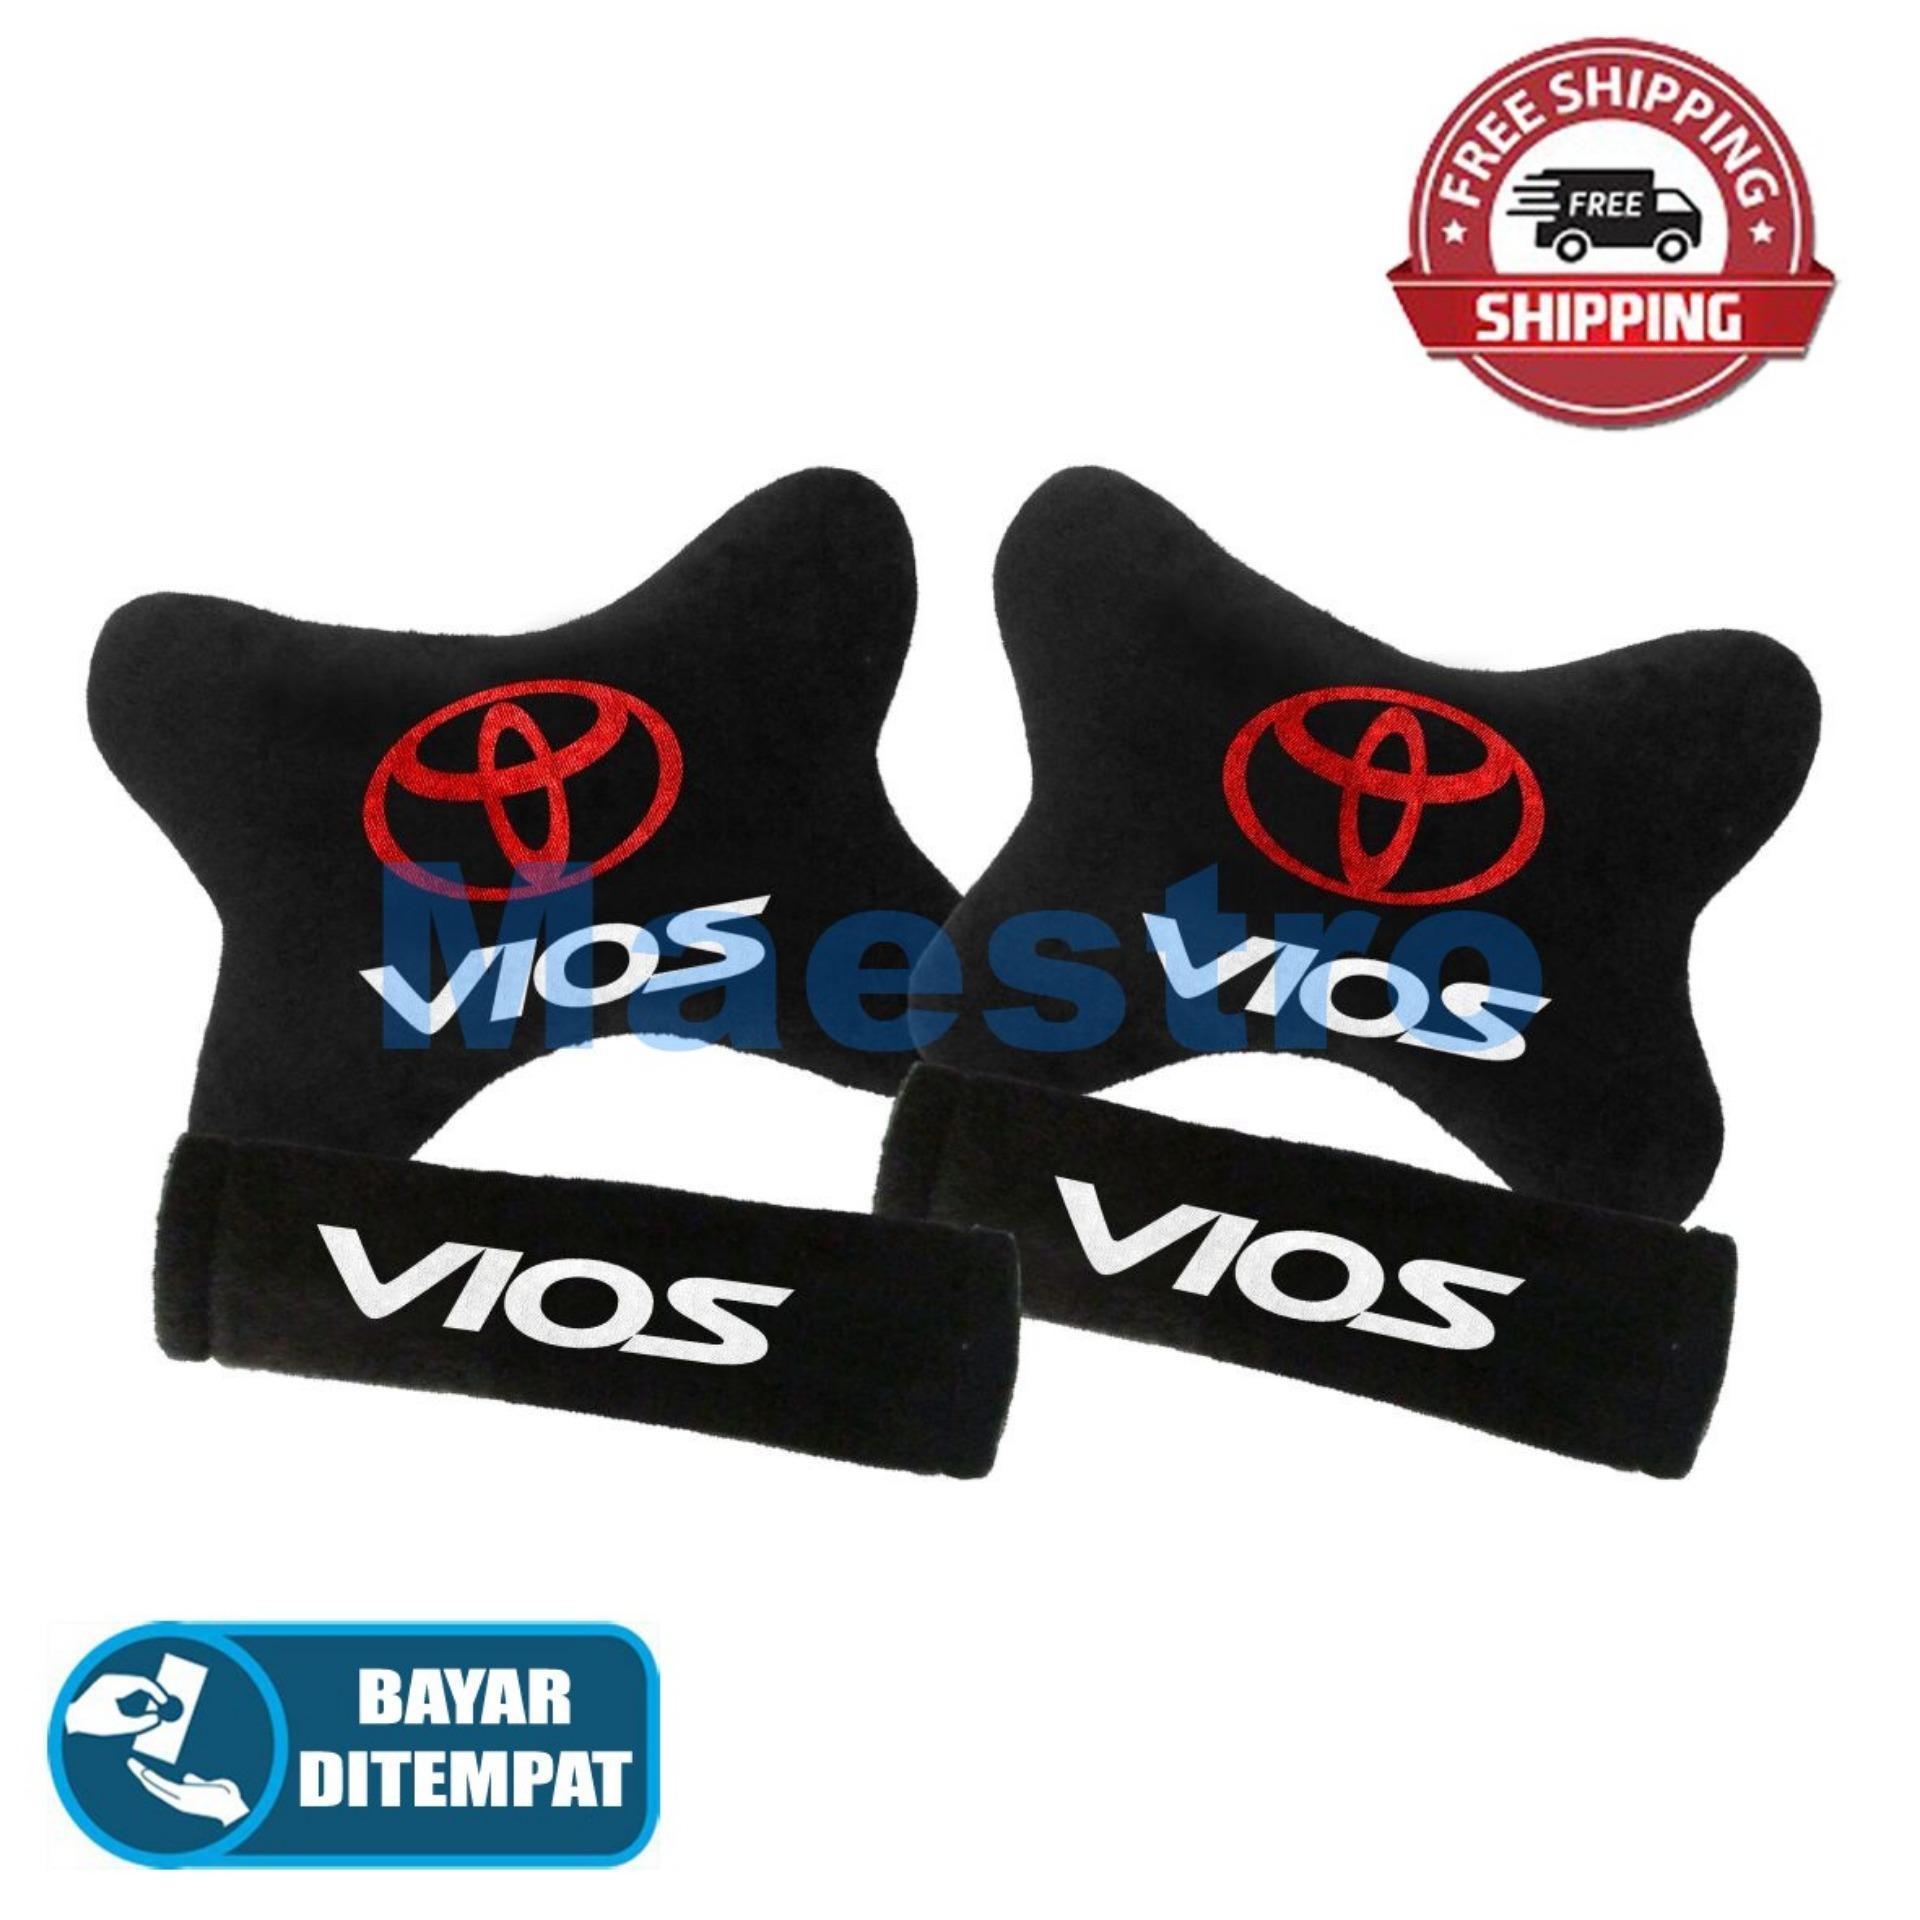 Aksesoris bantal leher jok mobil lucu unik Set 2in1 Toyota Vios